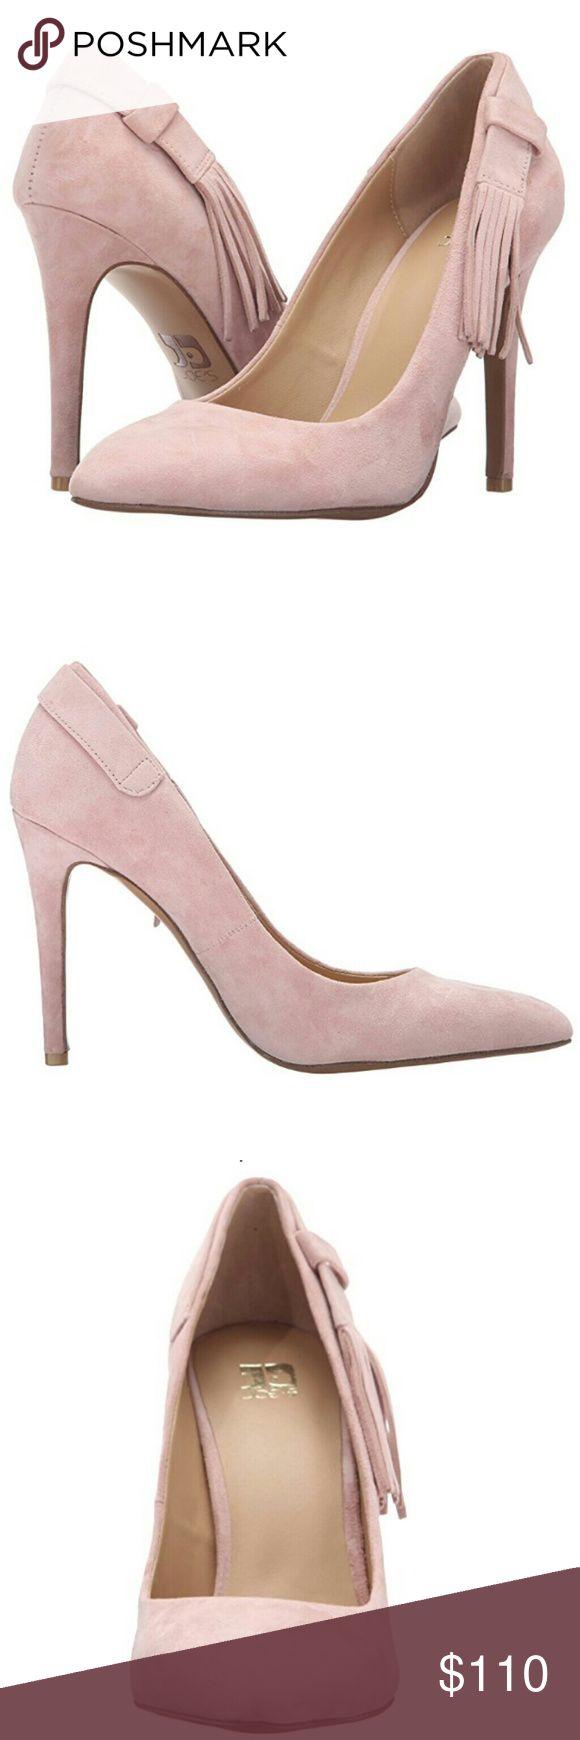 "Joe's catlin dress pumps Beautiful and chic pink tassel pumps, soft suede upper, heel approx 4"", brand new. joe's Shoes Heels"